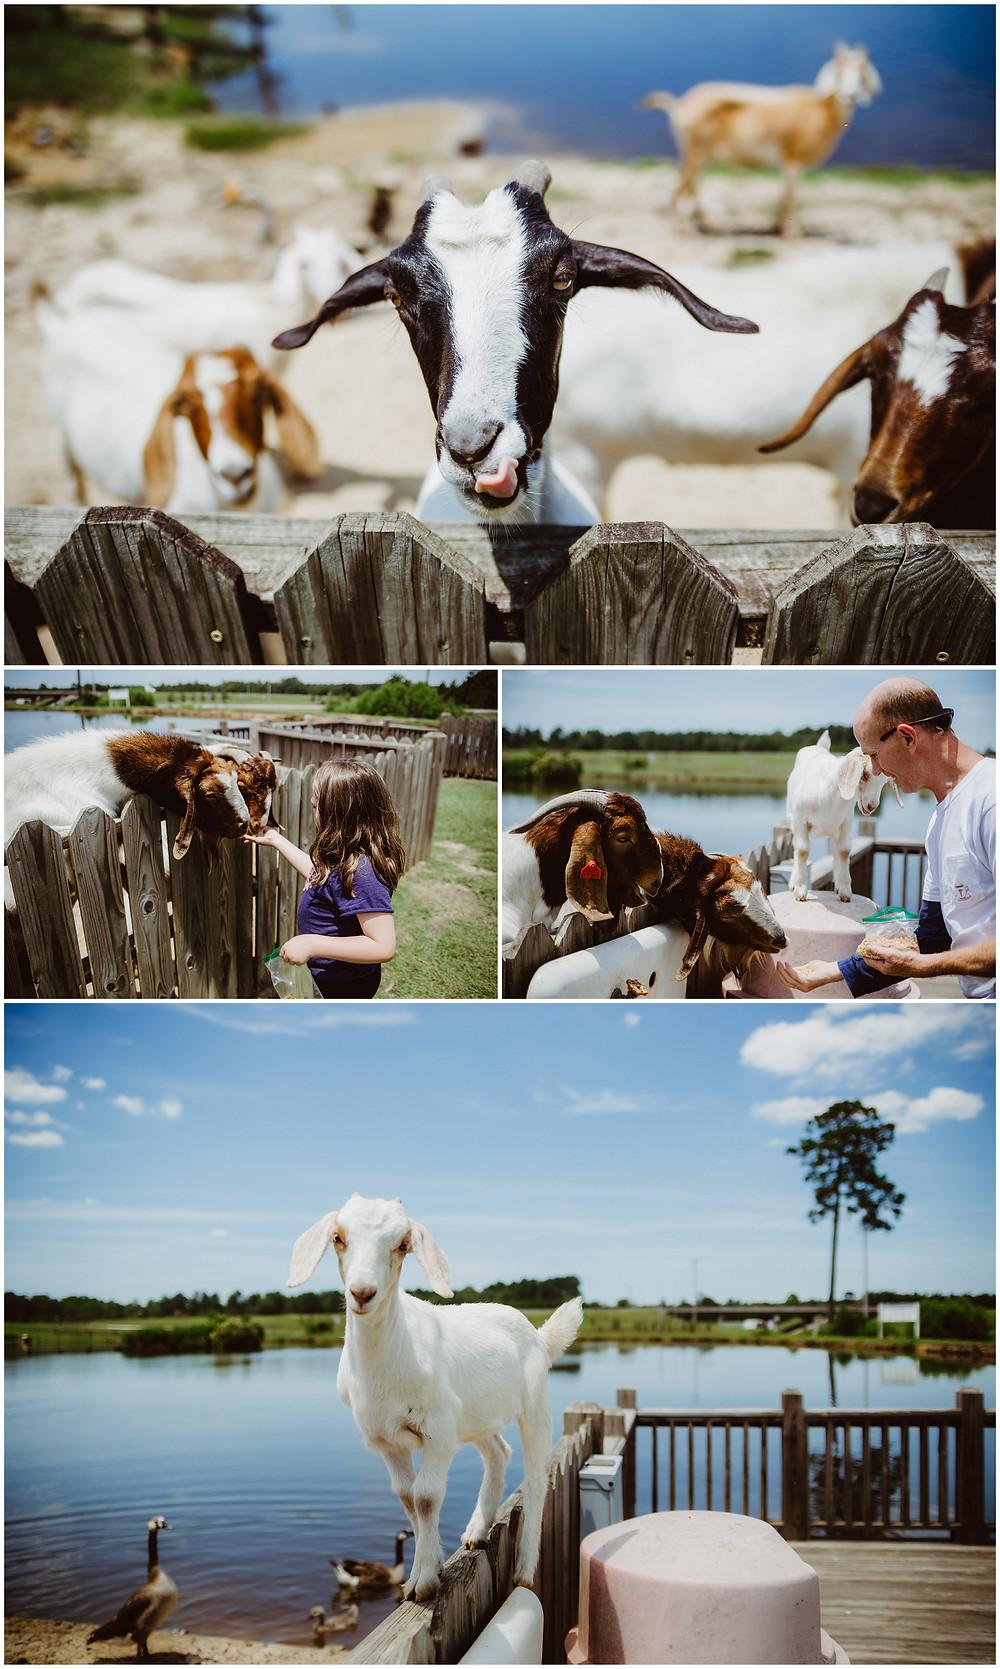 Georgia Travel Photography, Mosleys Famous Animal Farm Exit